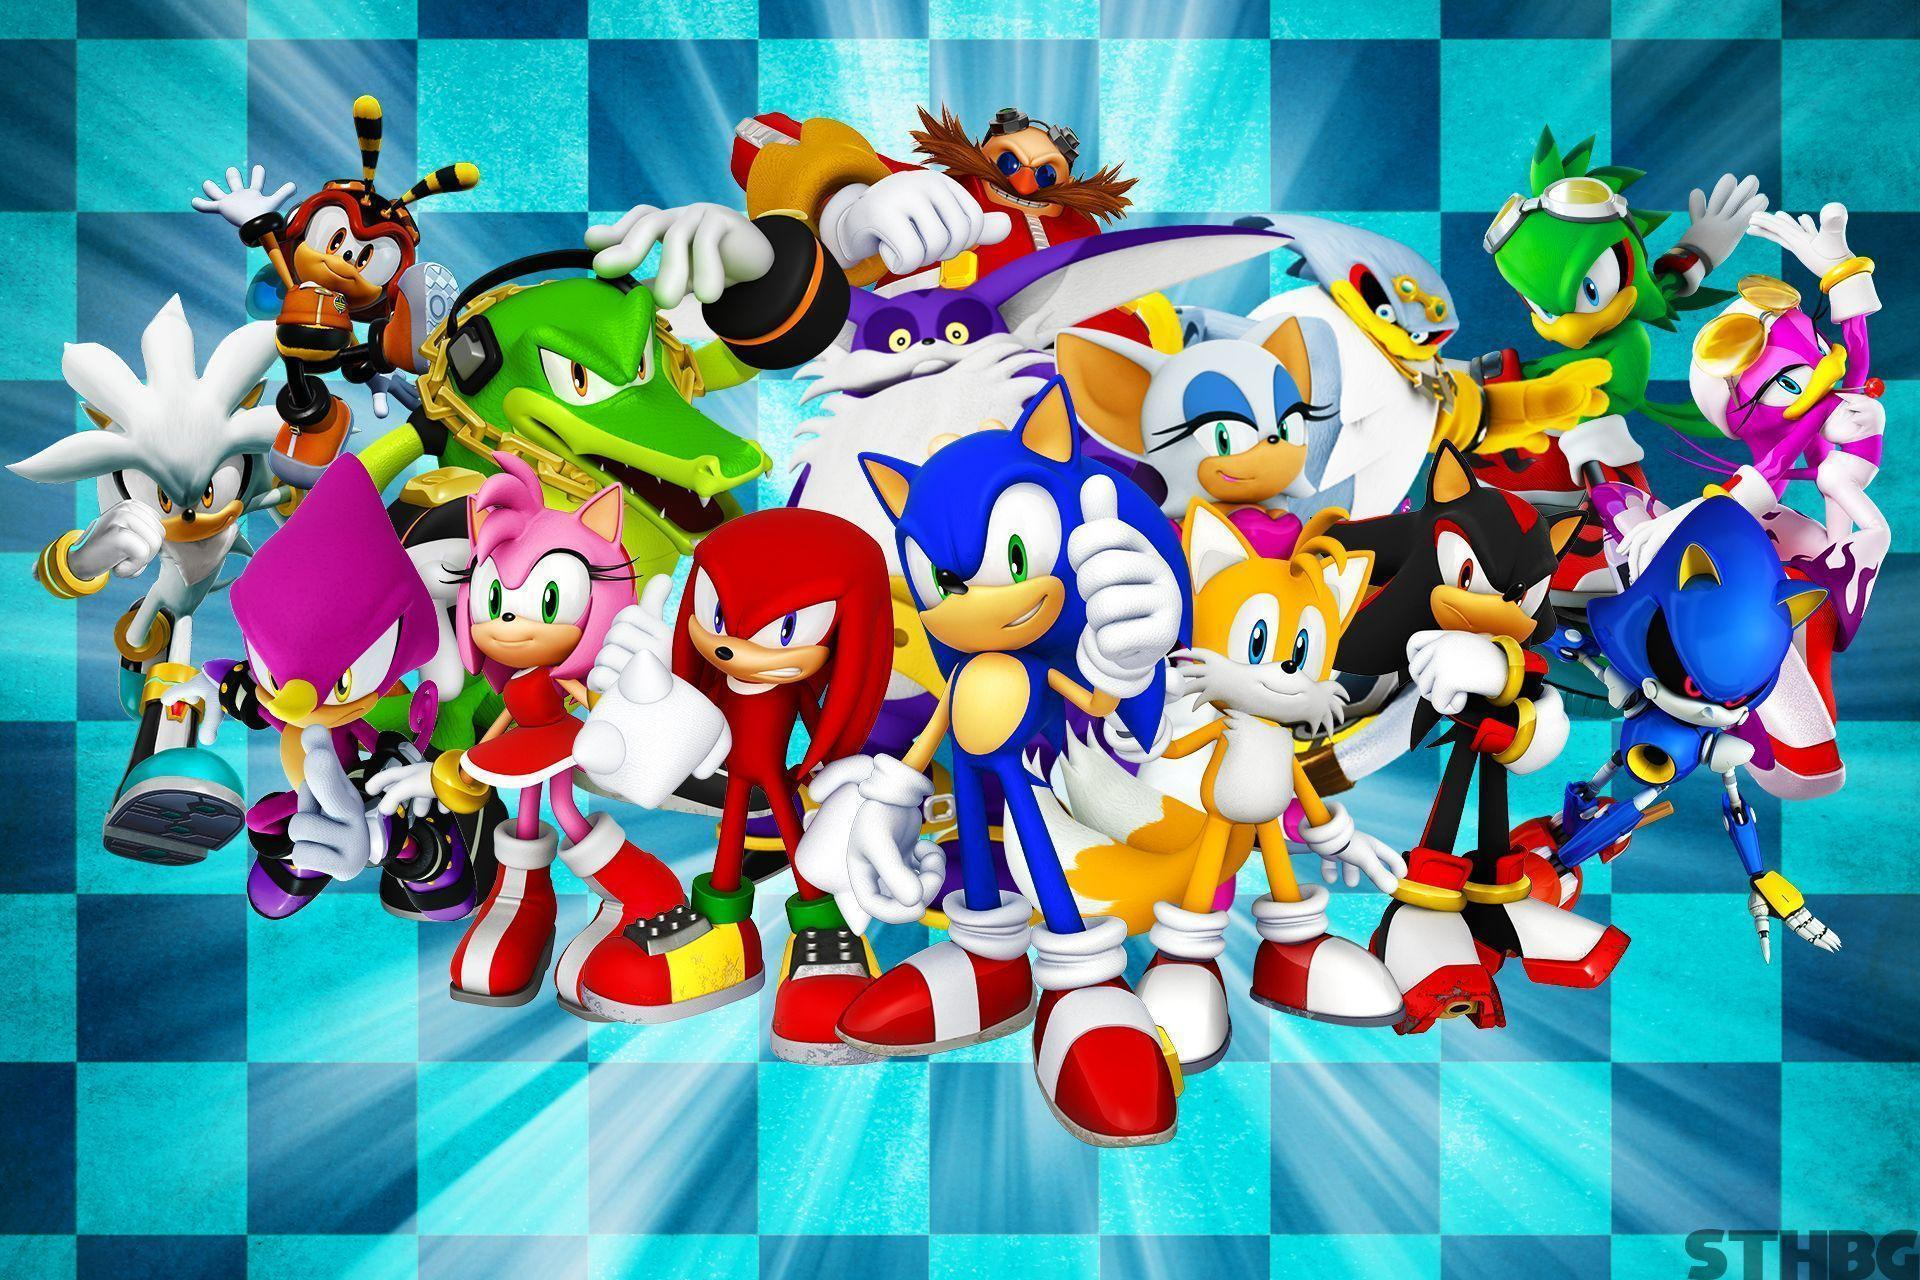 Sonic the hedgehog pron sex photo